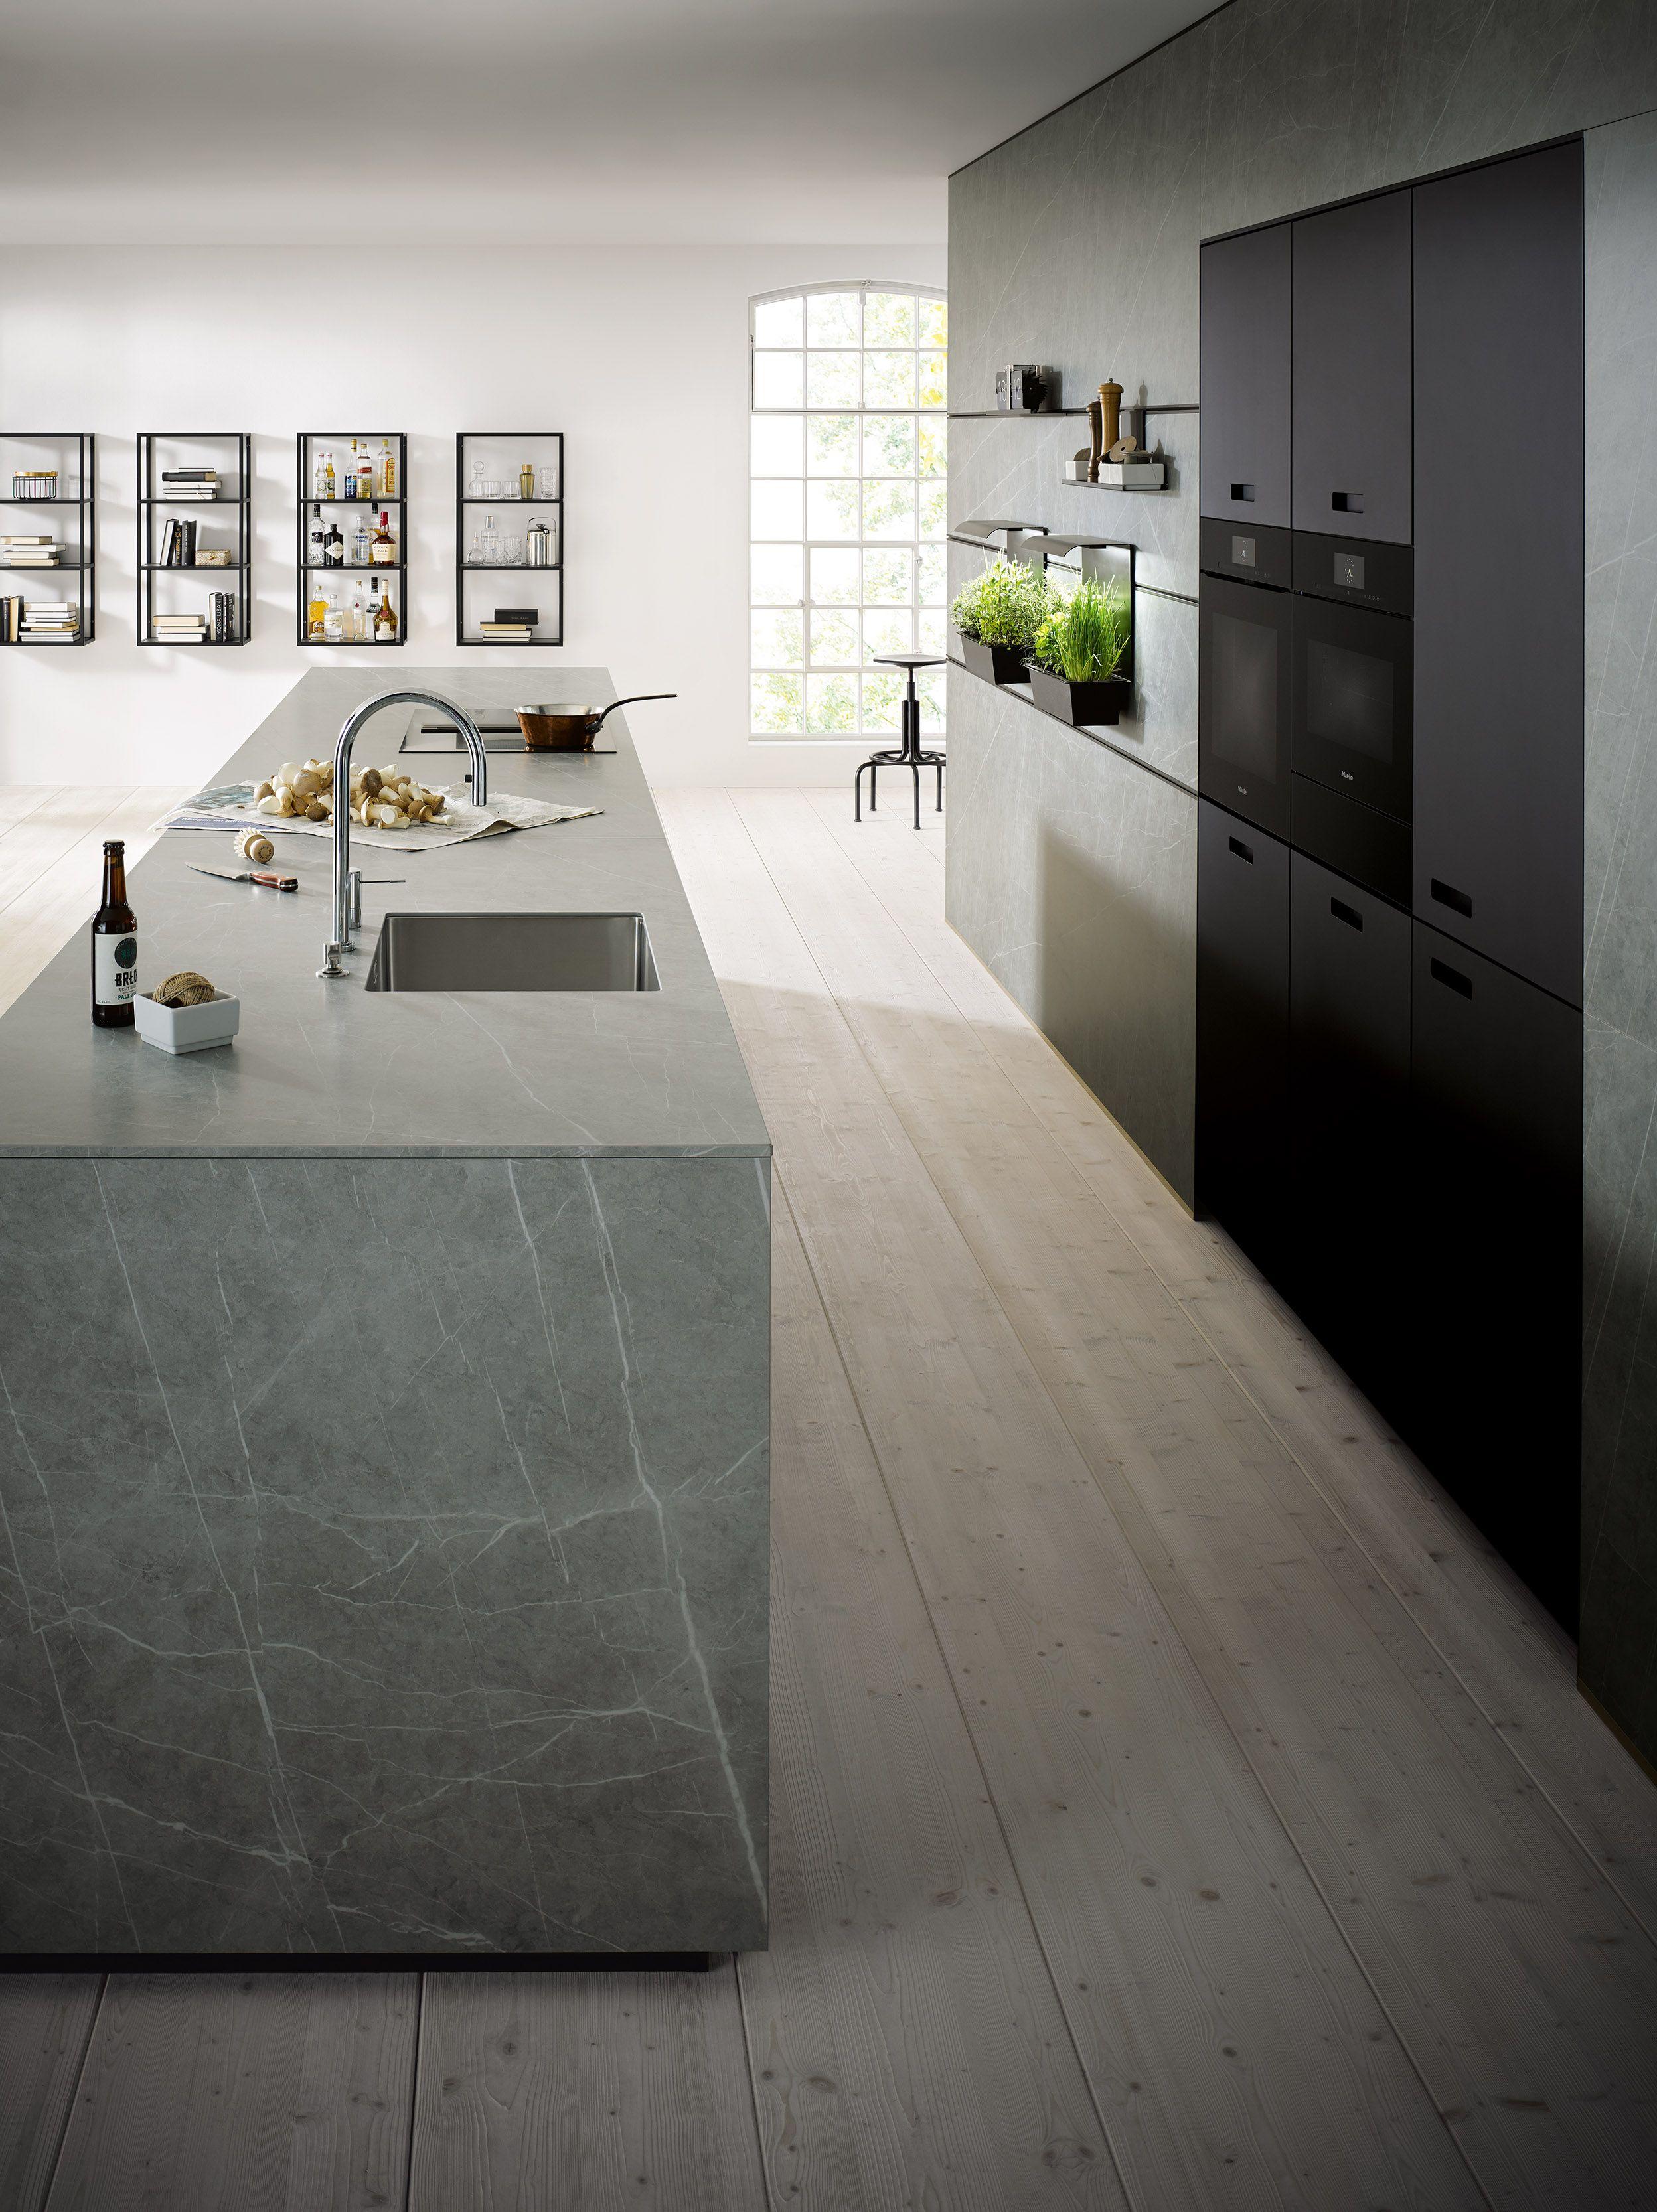 Nx950 Ceramic Marble Grigio Next125 Next125kitchens